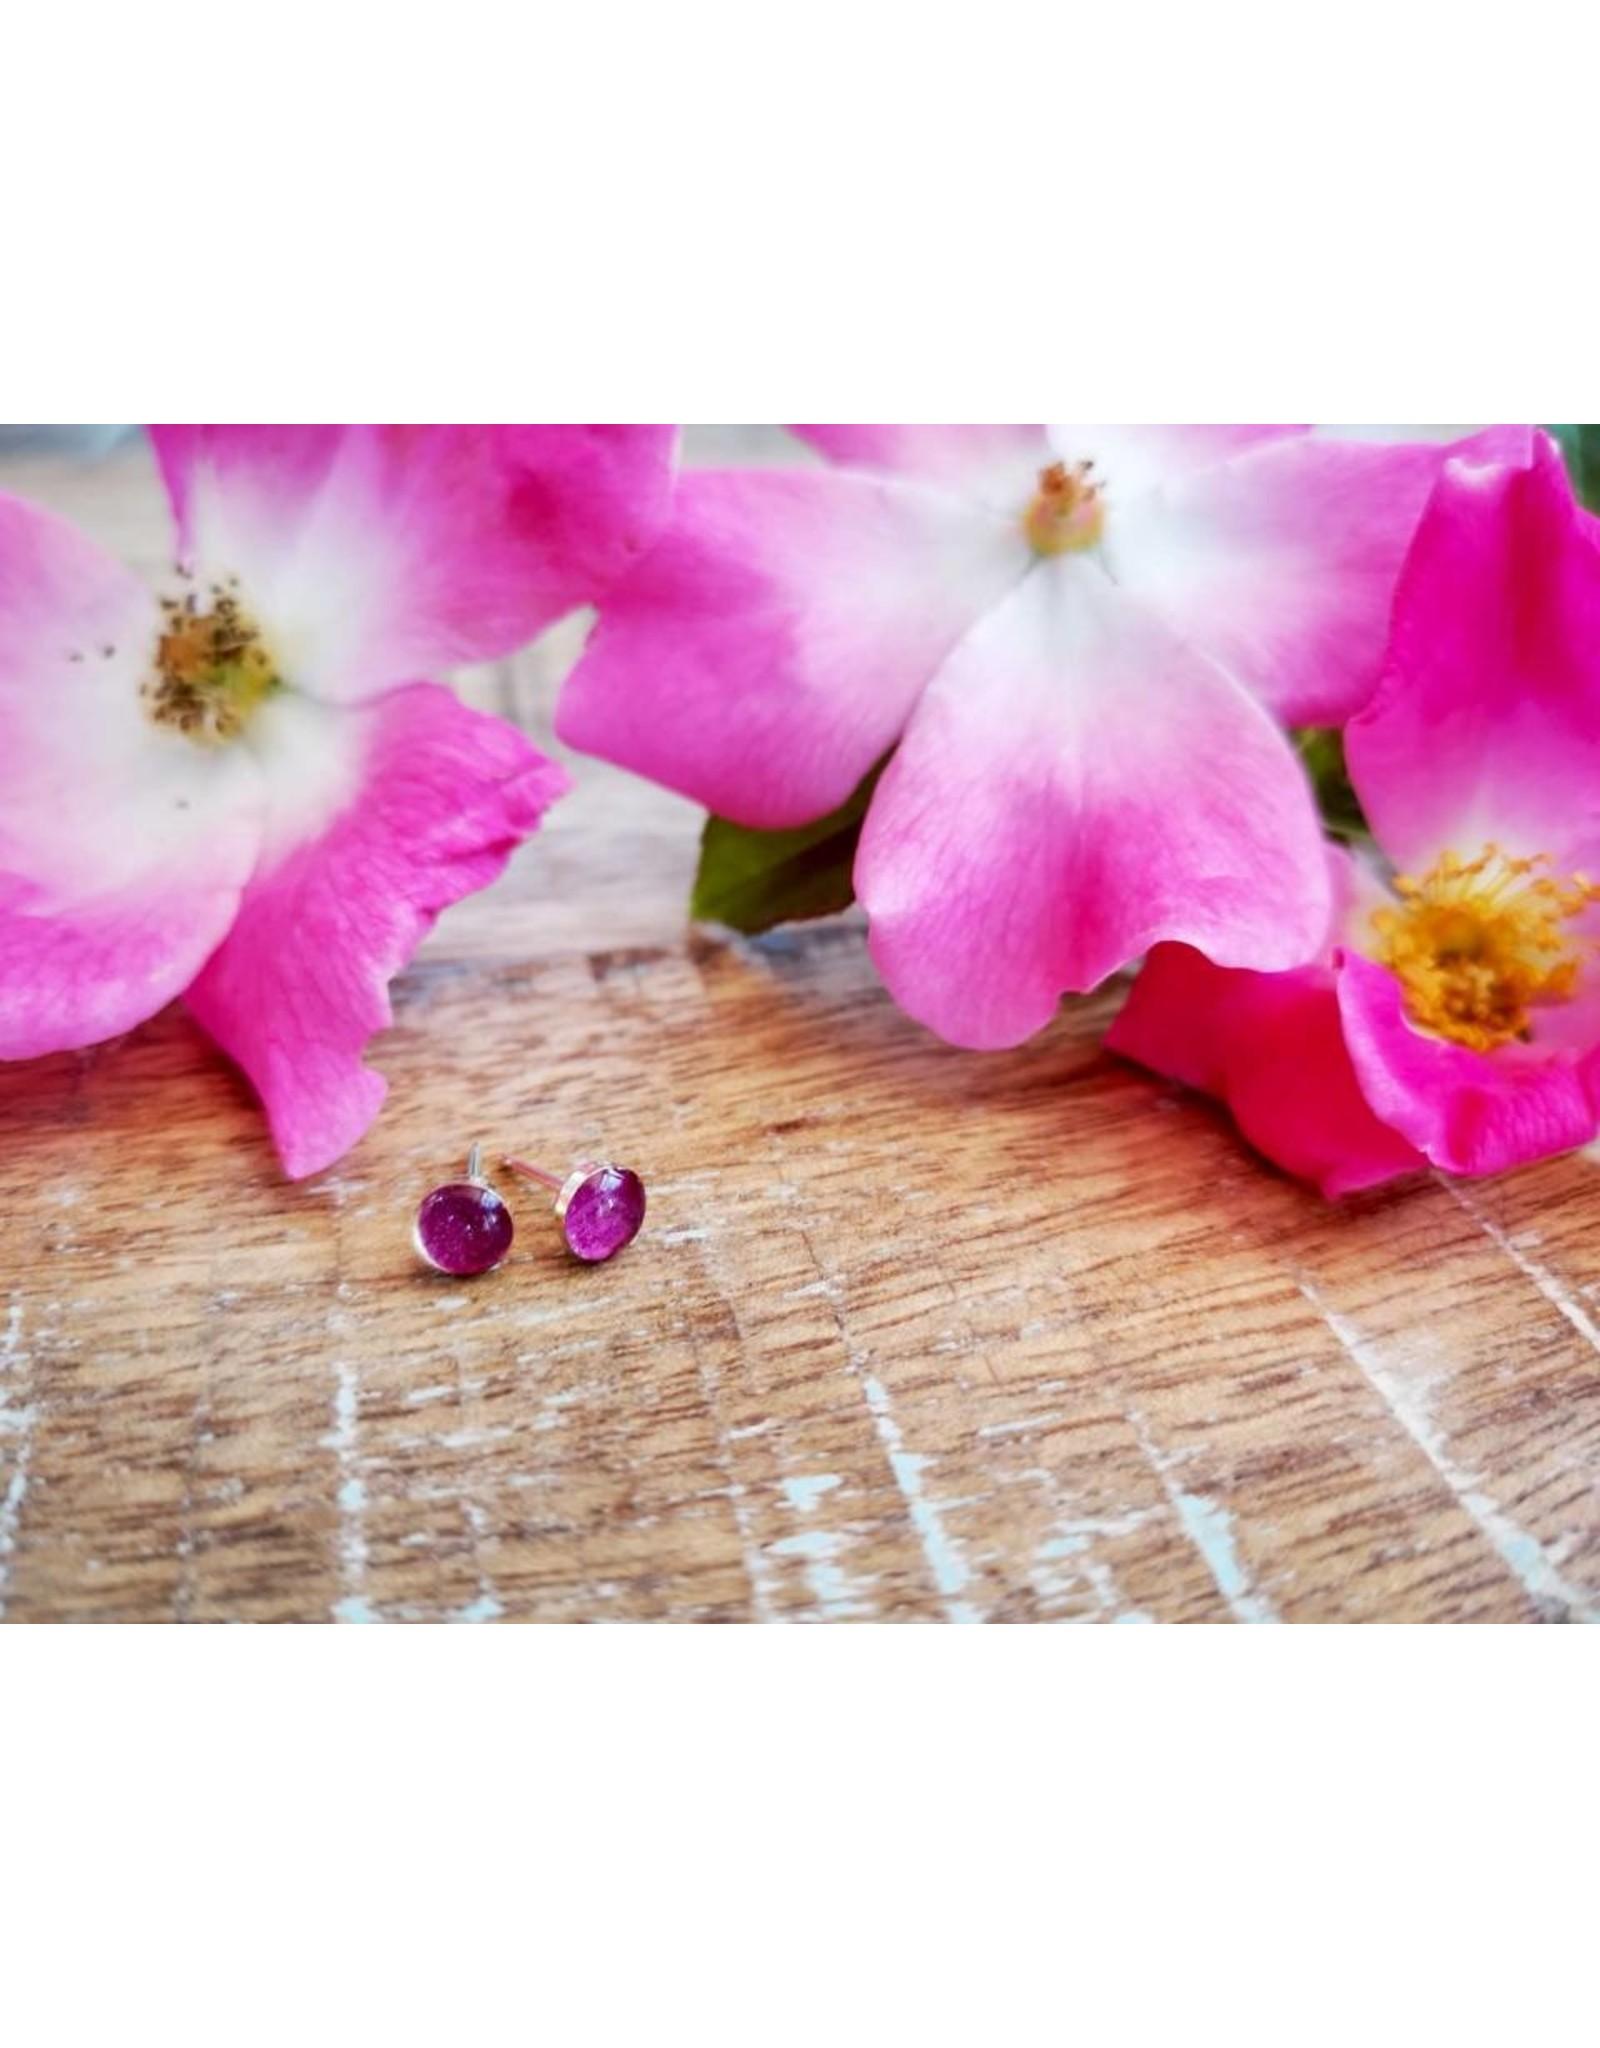 Alberta Wild Rose 4mm Silver Earrings - AB0504S